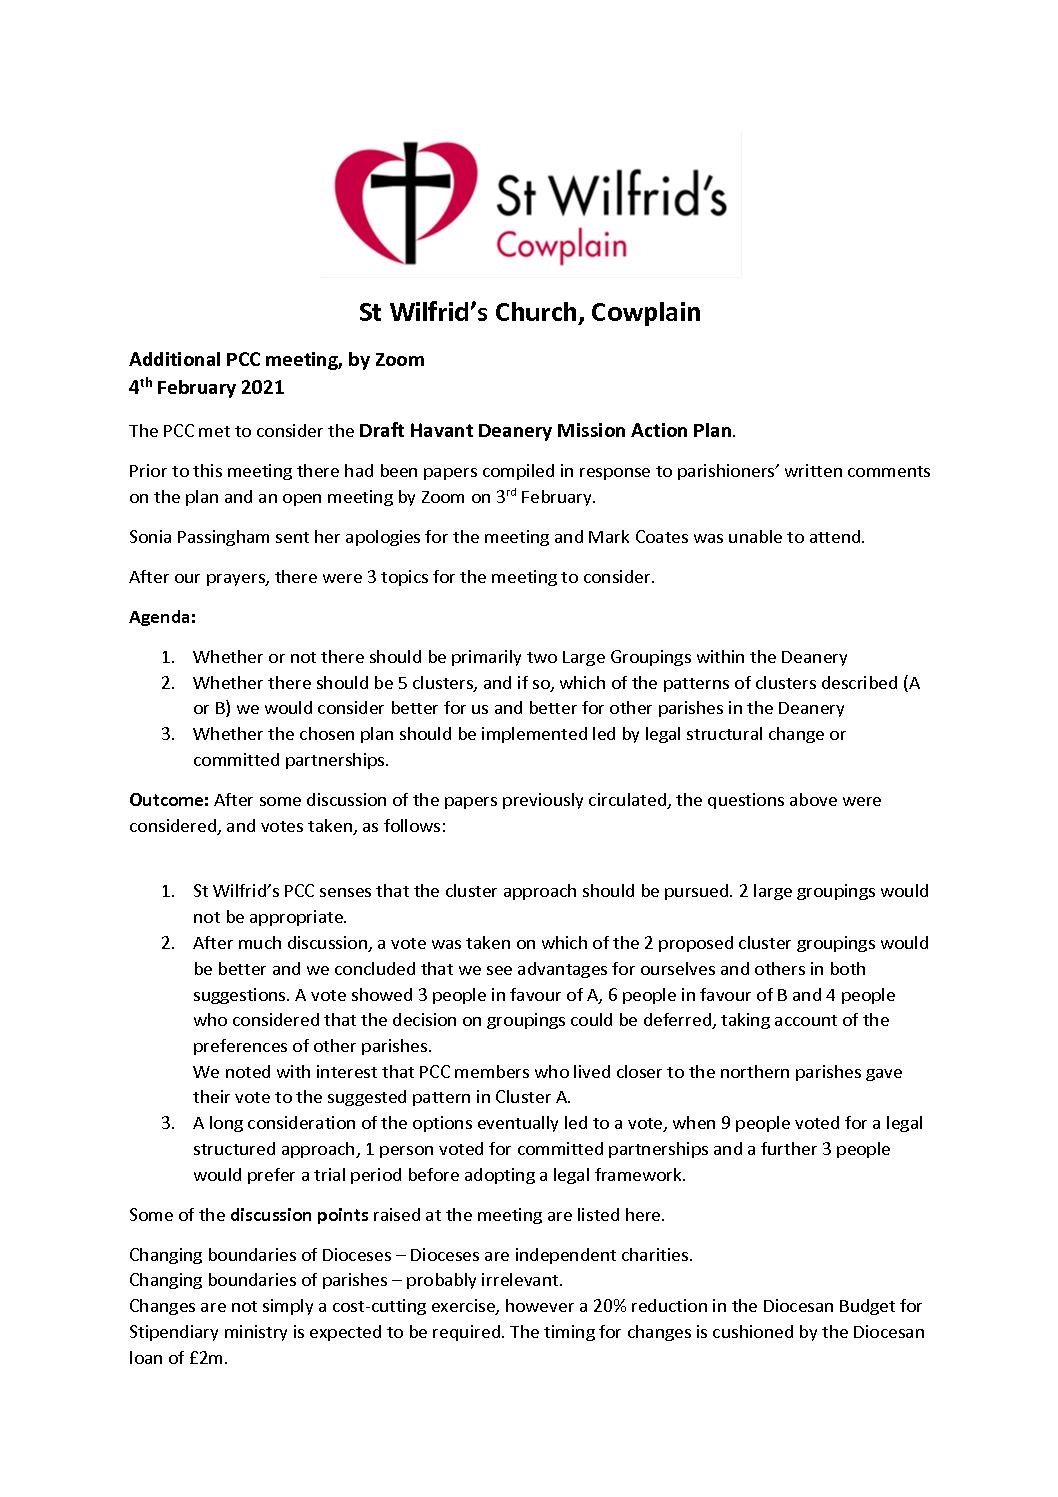 thumbnail of PCC meeting 4Feb2021 – Havant Deanery Plan response